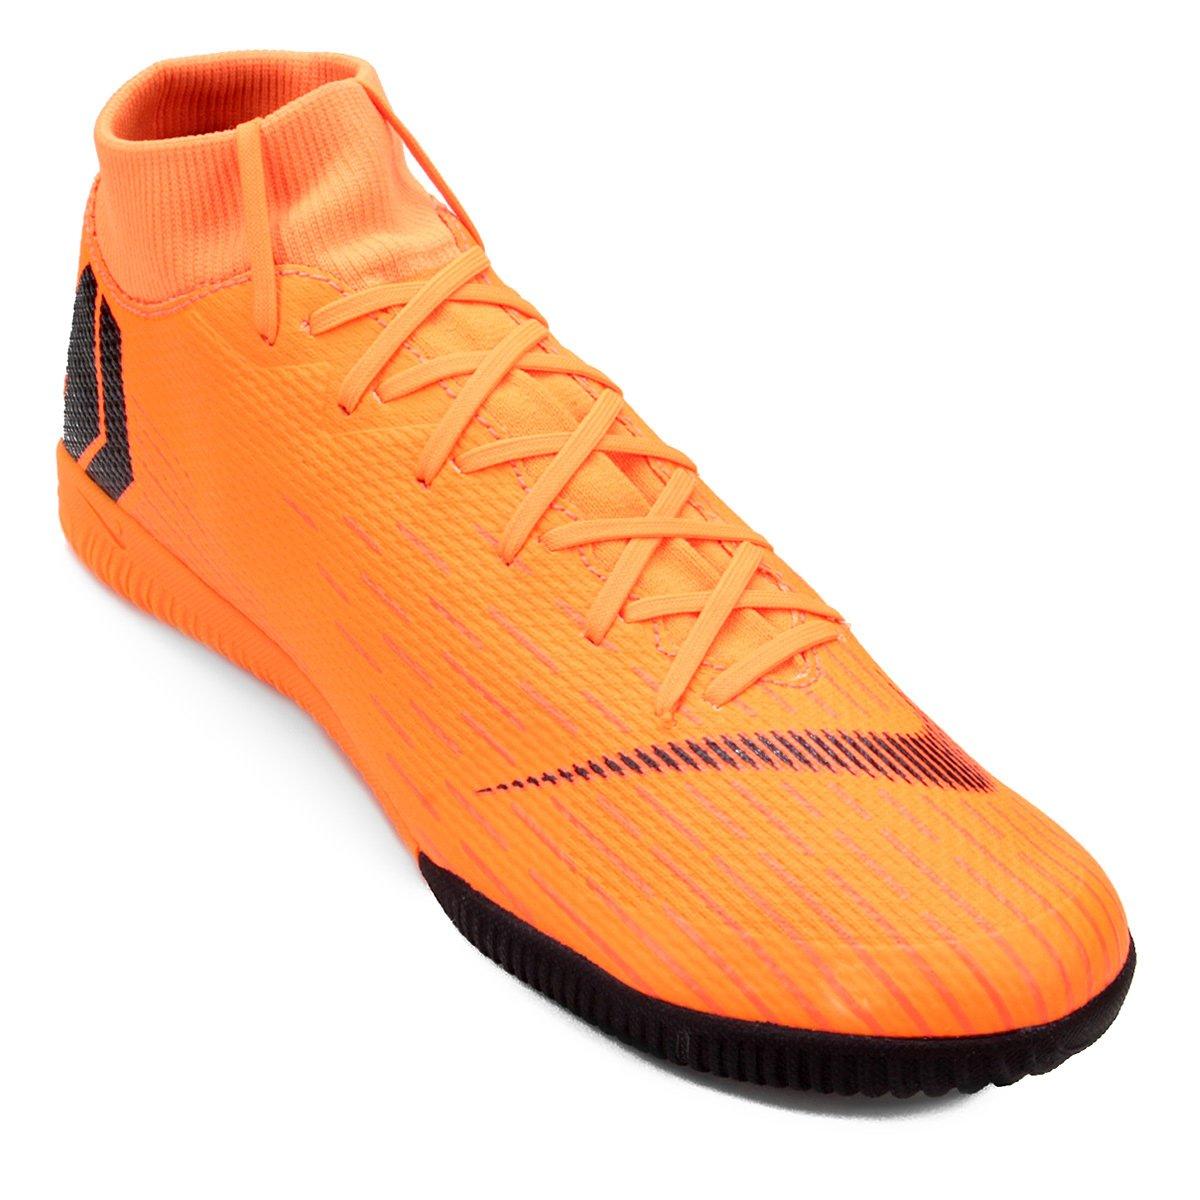 543278cb40411 Chuteira Futsal Nike Mercurial Superfly 6 Academy - Laranja e Preto -  Compre Agora